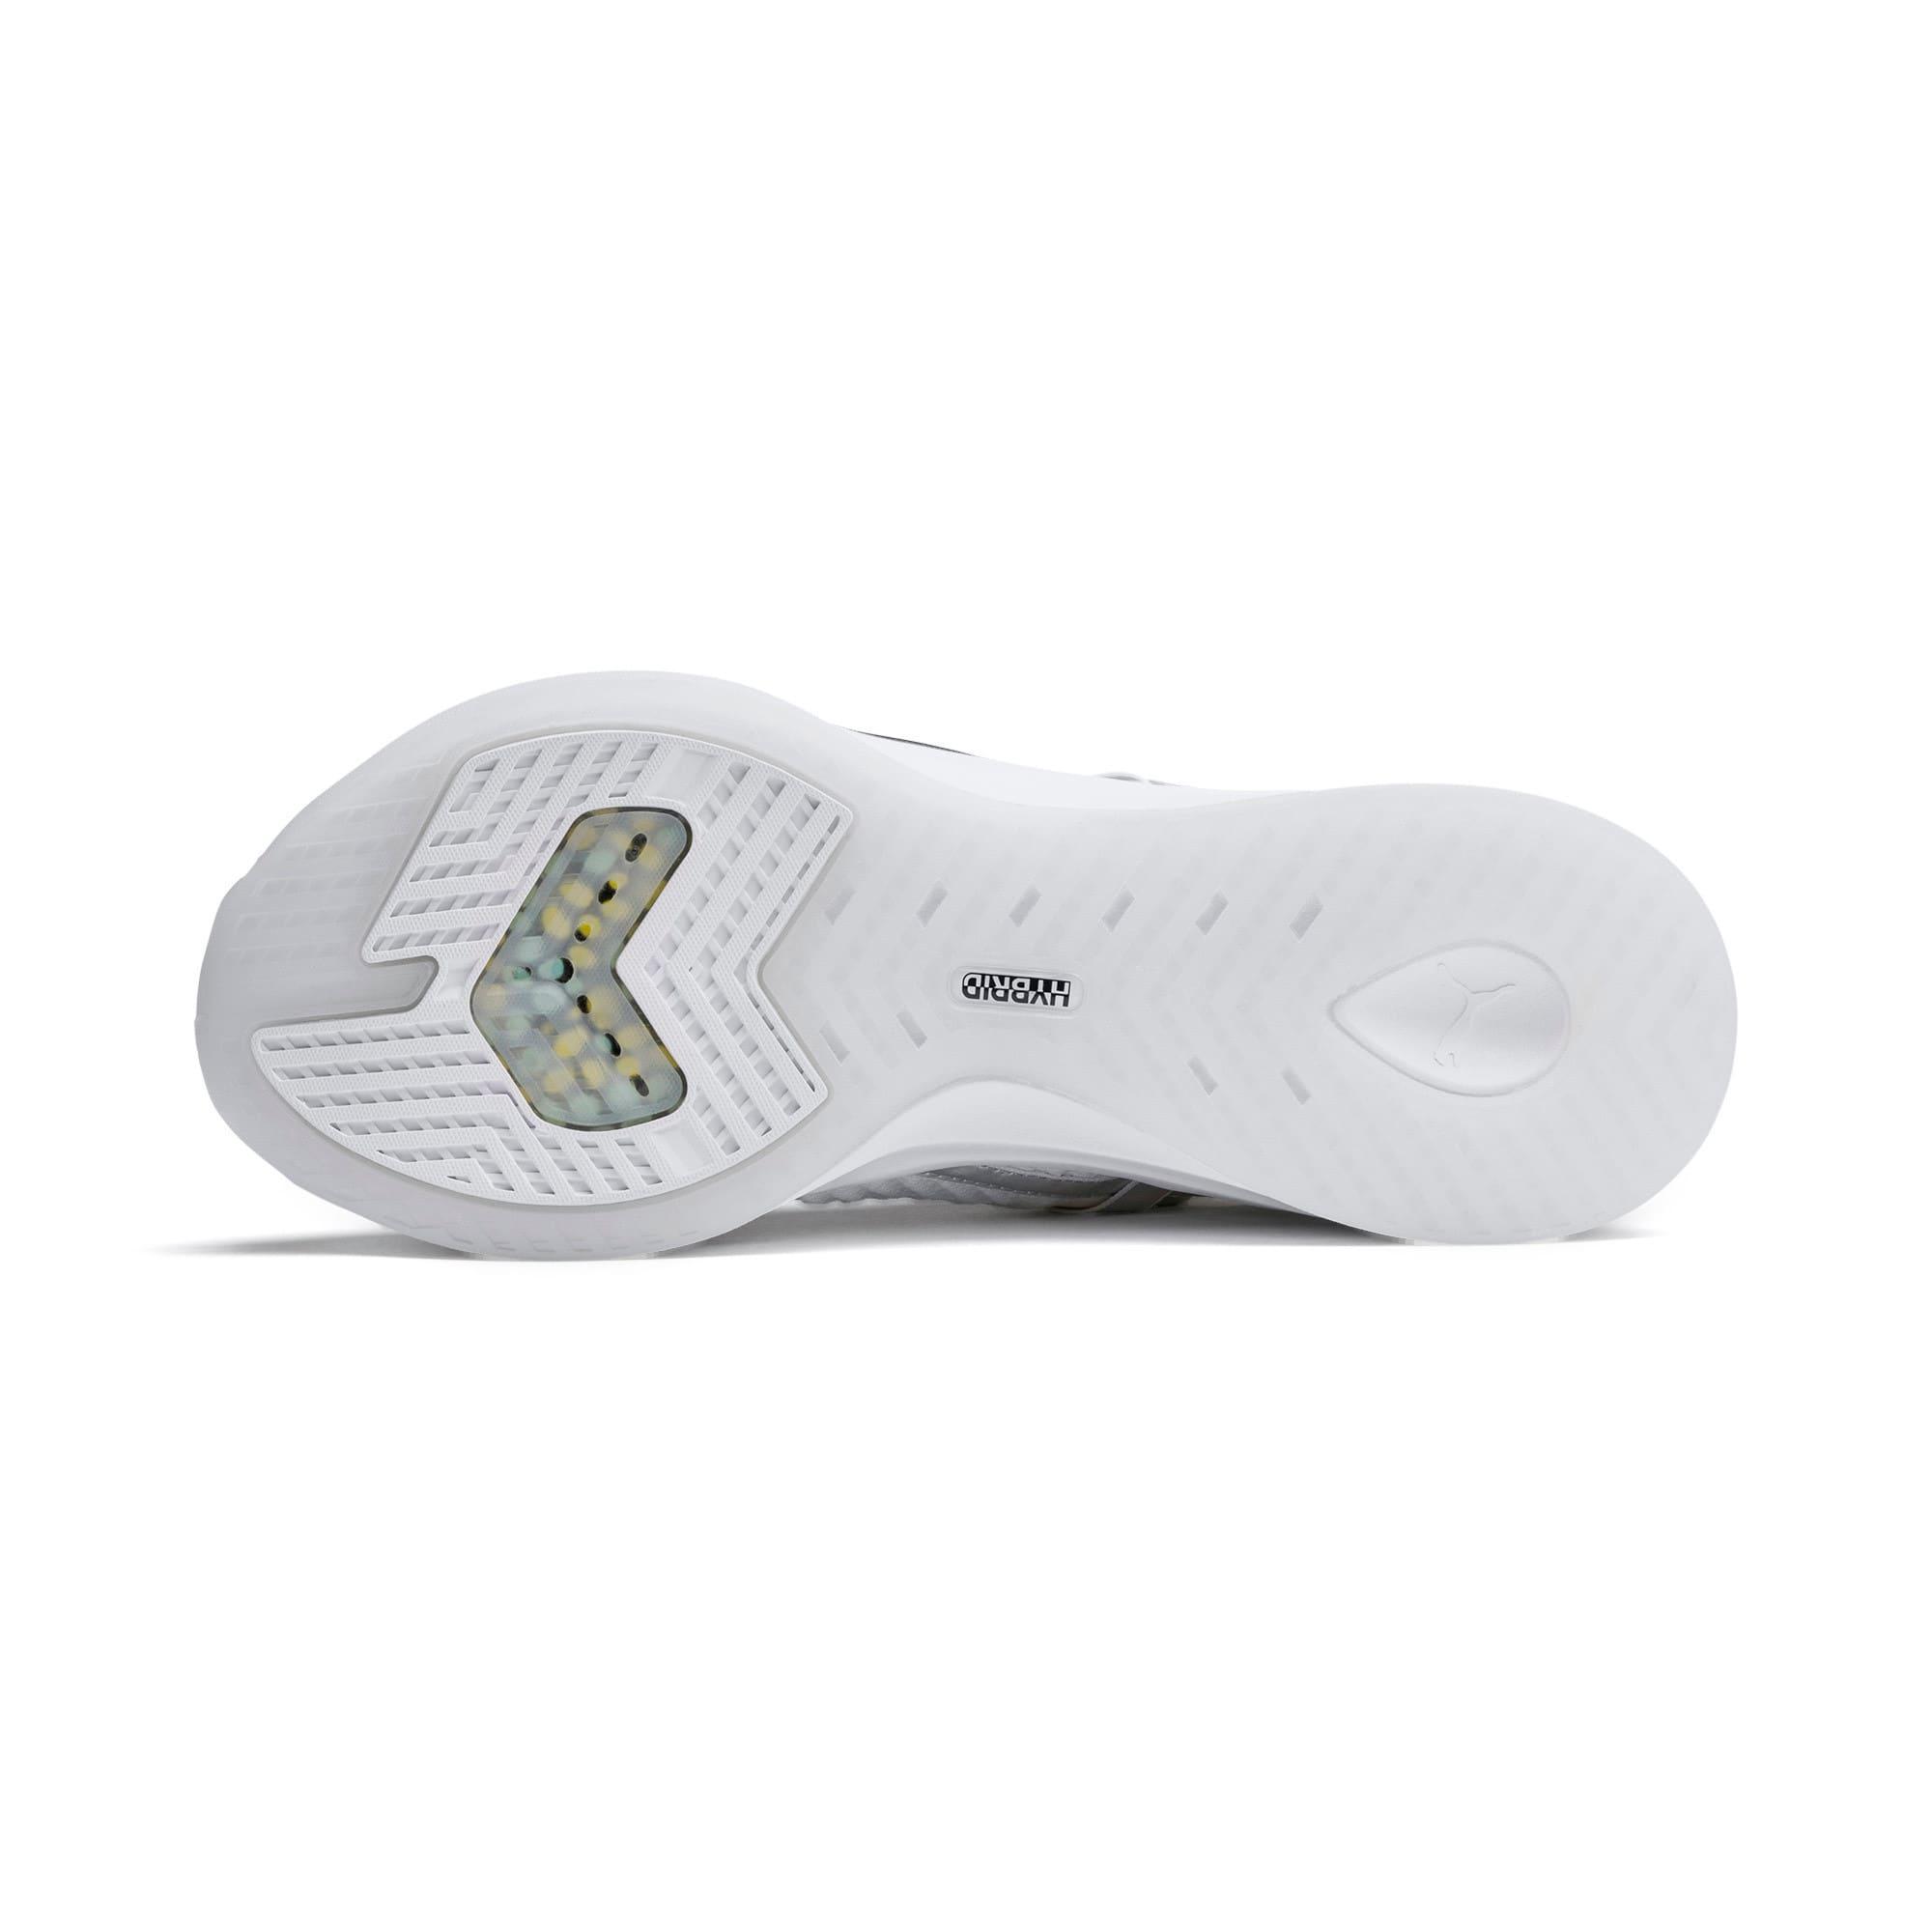 Thumbnail 5 of Jaab XT Iridescent Trailblazer Women's Training Shoes, Puma White-Puma Black, medium